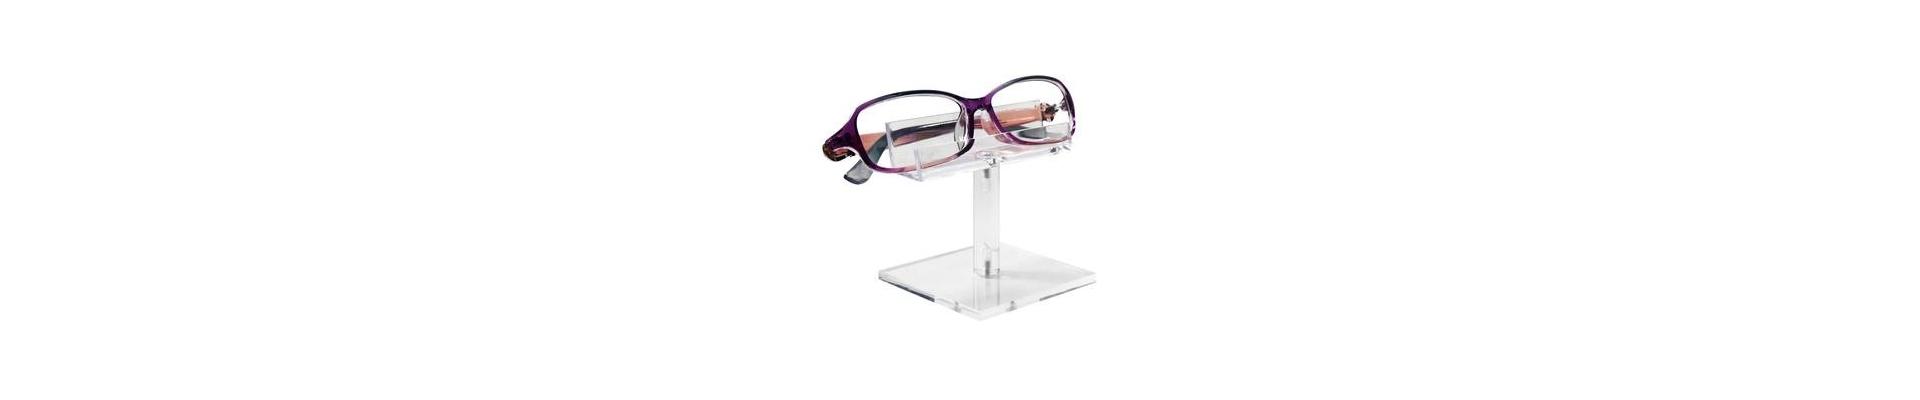 Eyewear Displays - Wood or Methacrylate for 10, 12, 40 & 60 units.